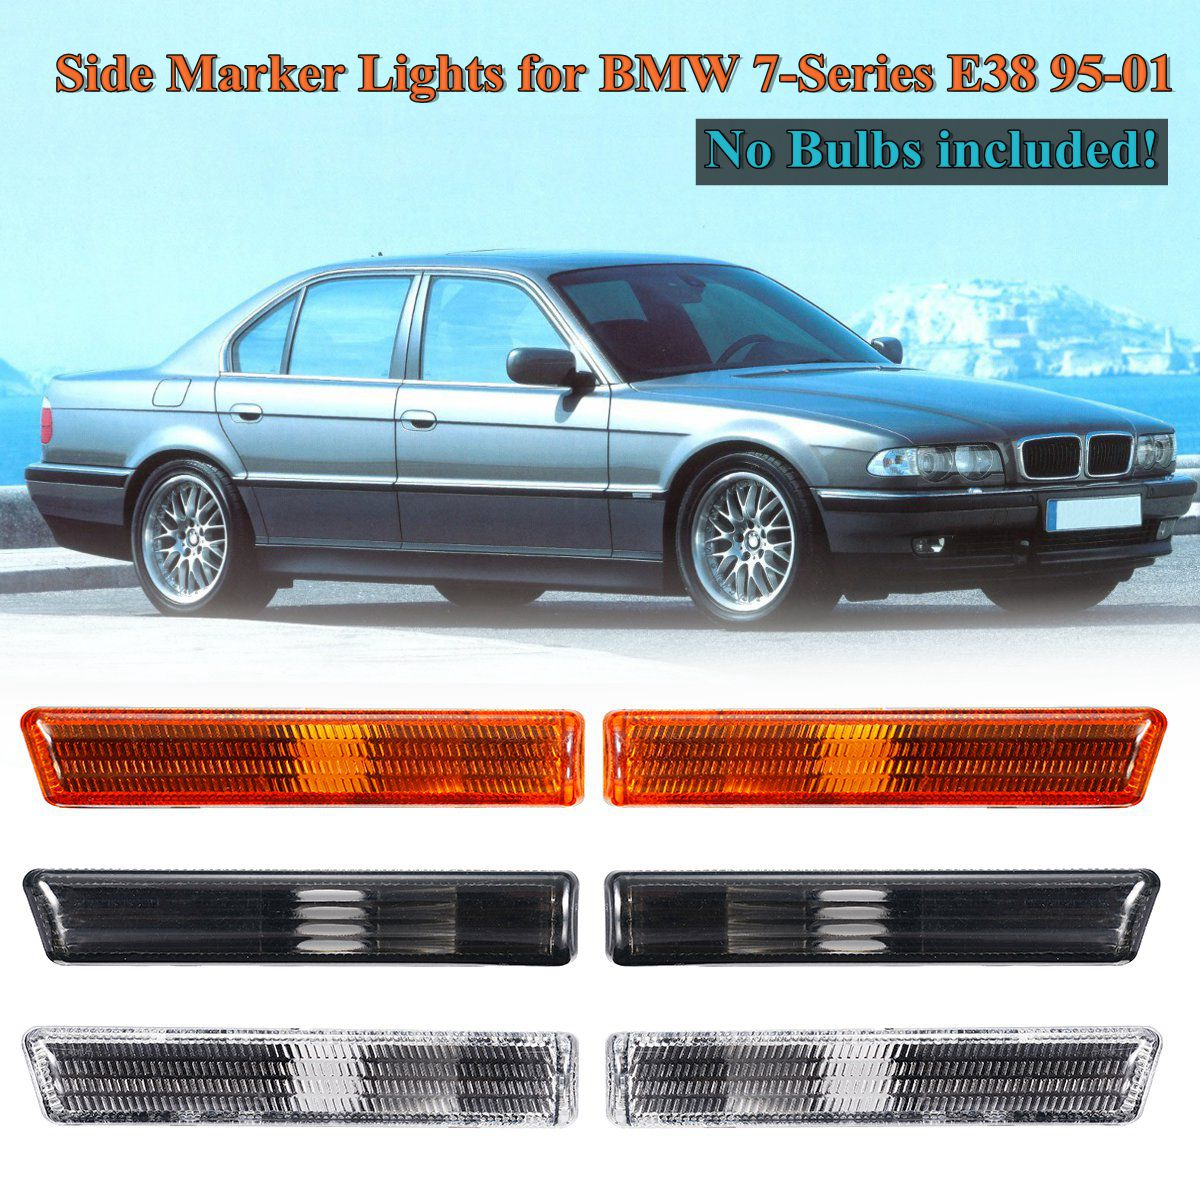 Bumper Trim compatible with BMW 7-Series 95-01 Rear Center Strip Chrome Plastic